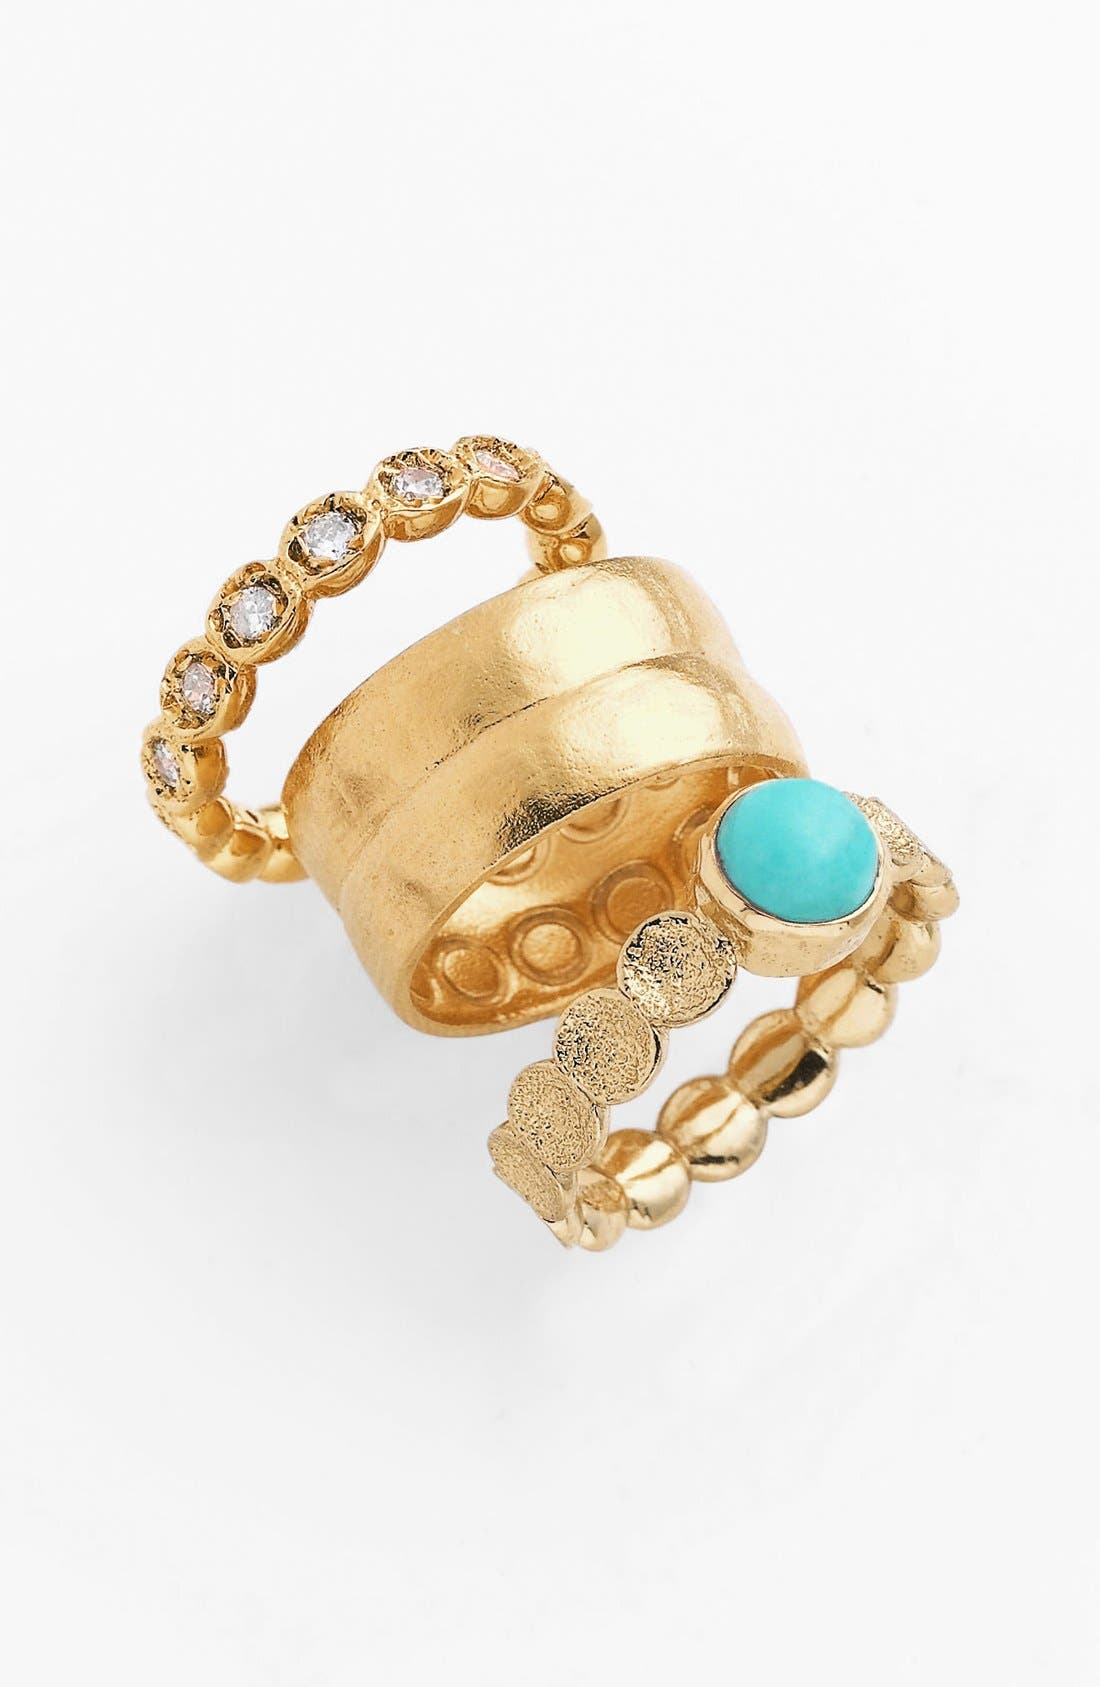 Main Image - Melinda Maria 'Capulet' Stackable Rings (Set of 3) (Nordstrom Exclusive)